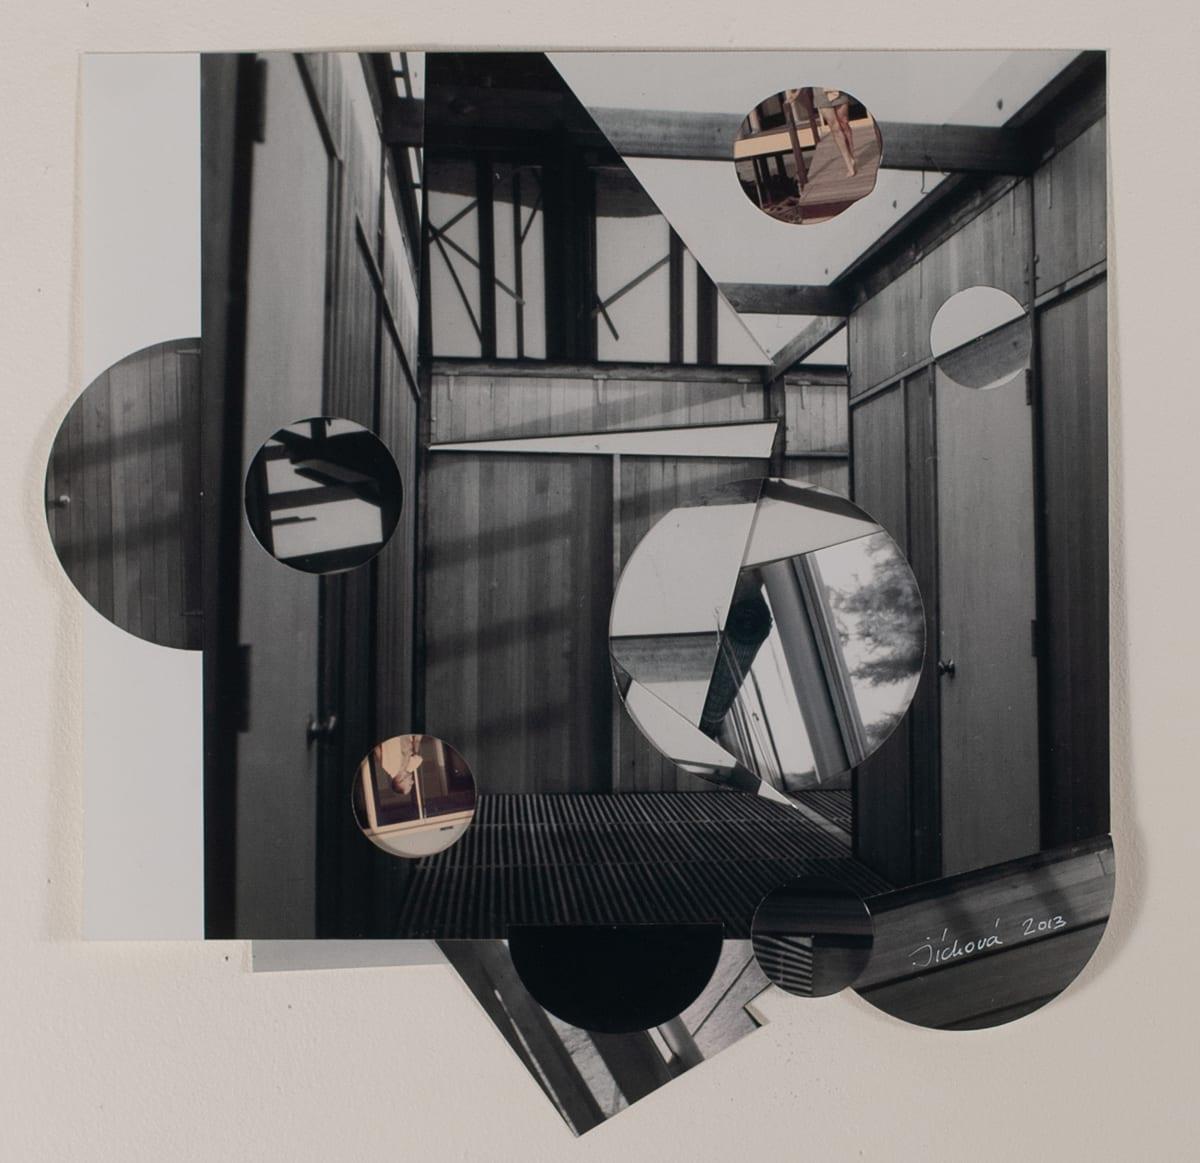 Bara Jichova Tyson, The Hatch House 3, 2014